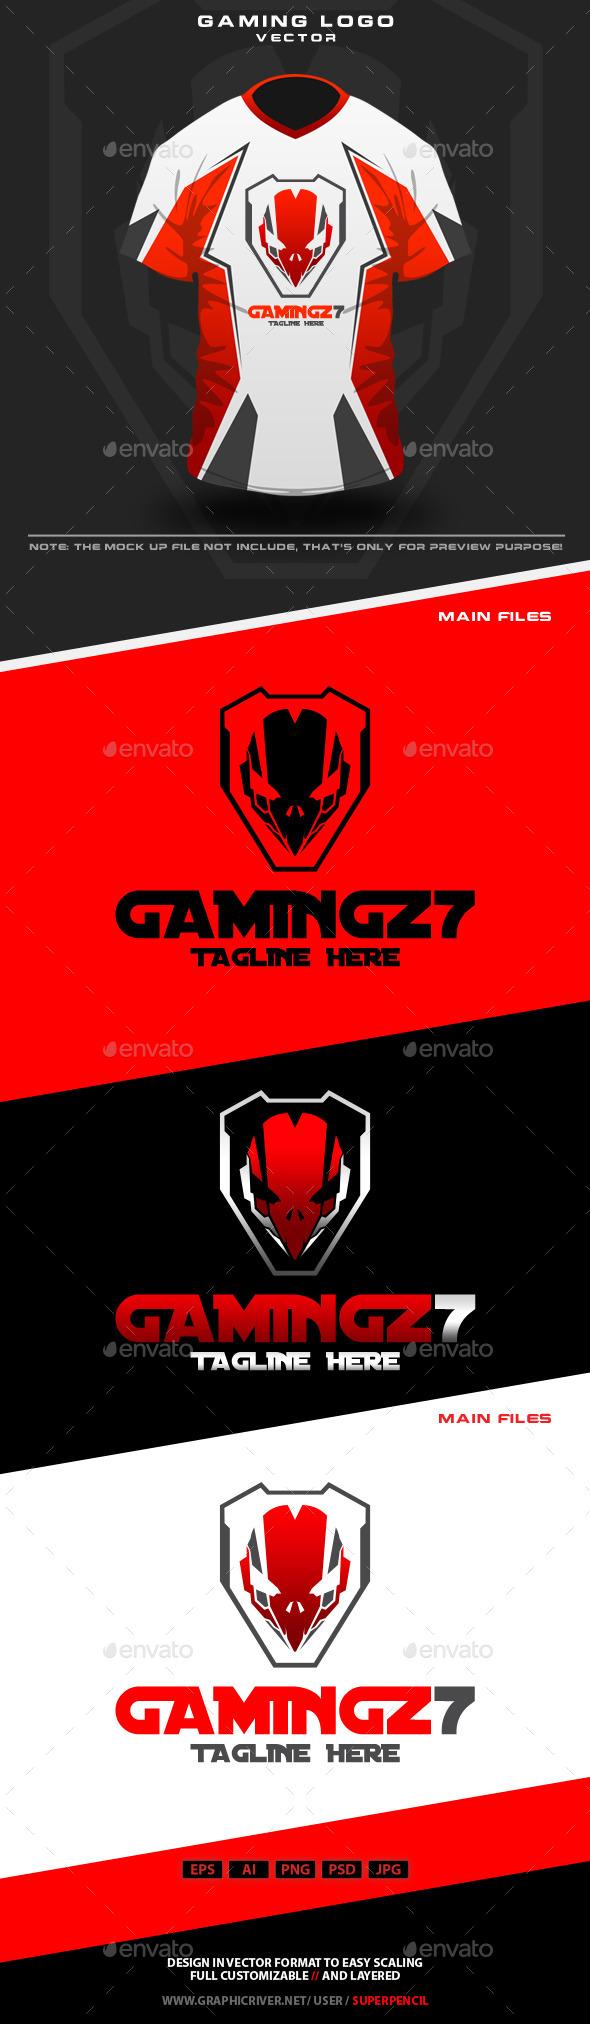 GraphicRiver Gamingz7 Logo 10648044